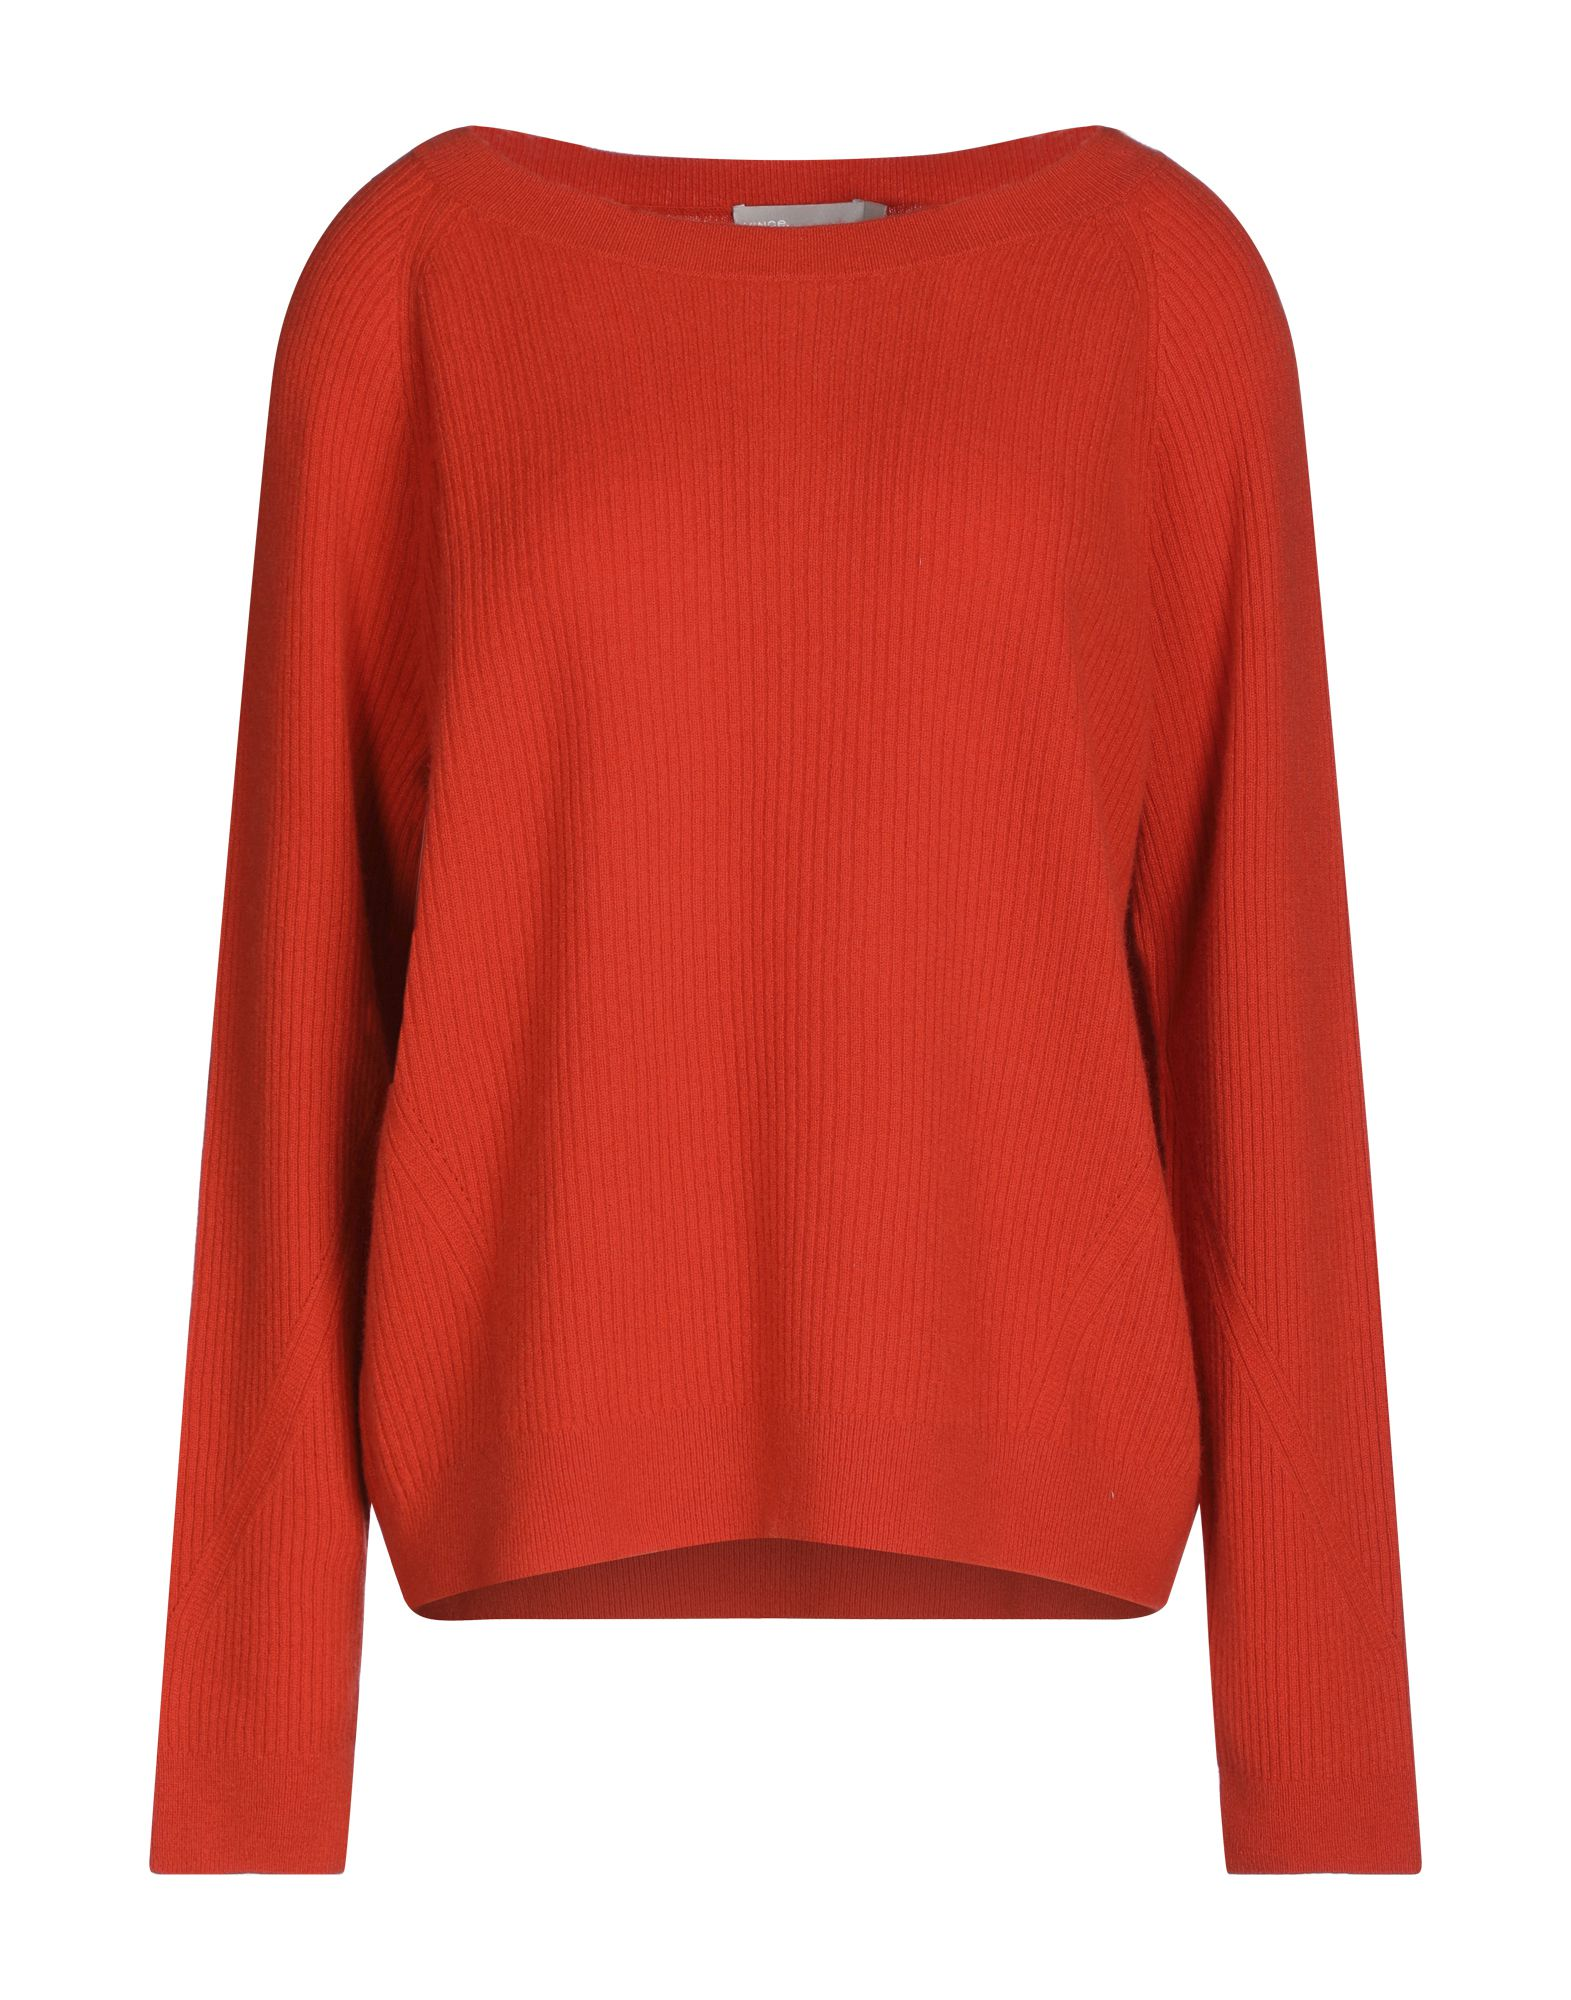 VINCE. Свитер moncler шерстяной свитер